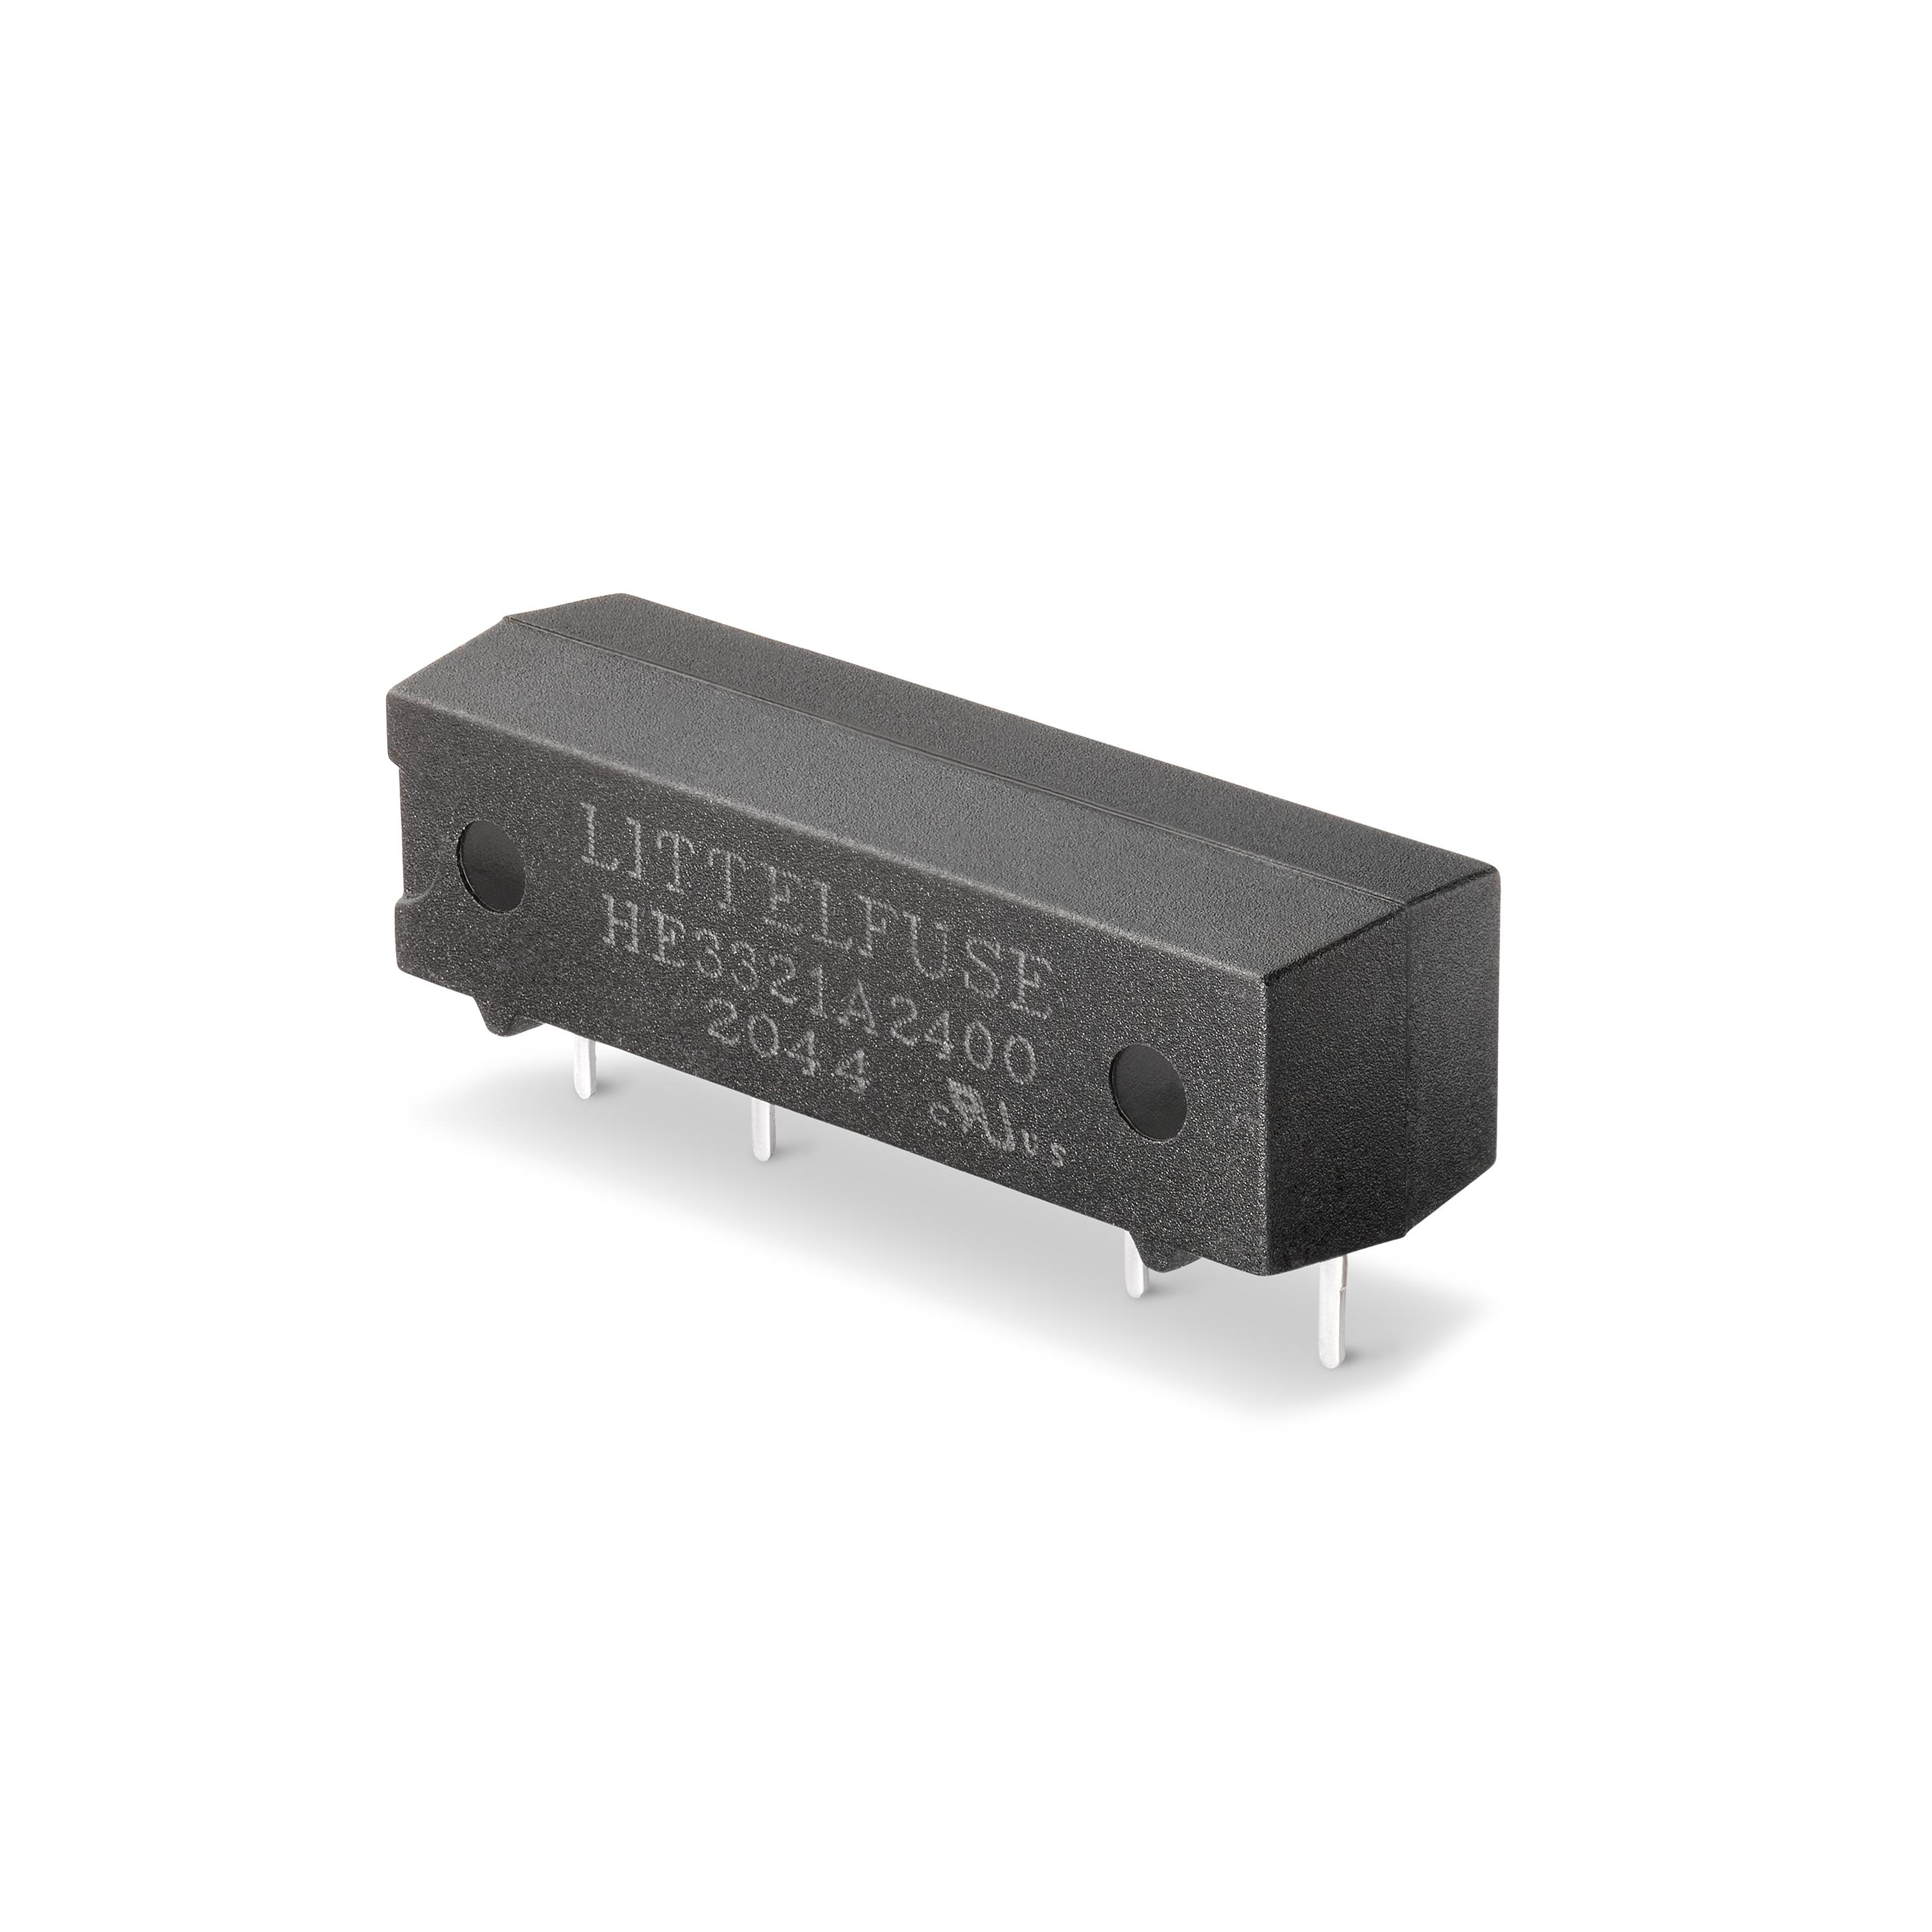 HE3300 Series Image